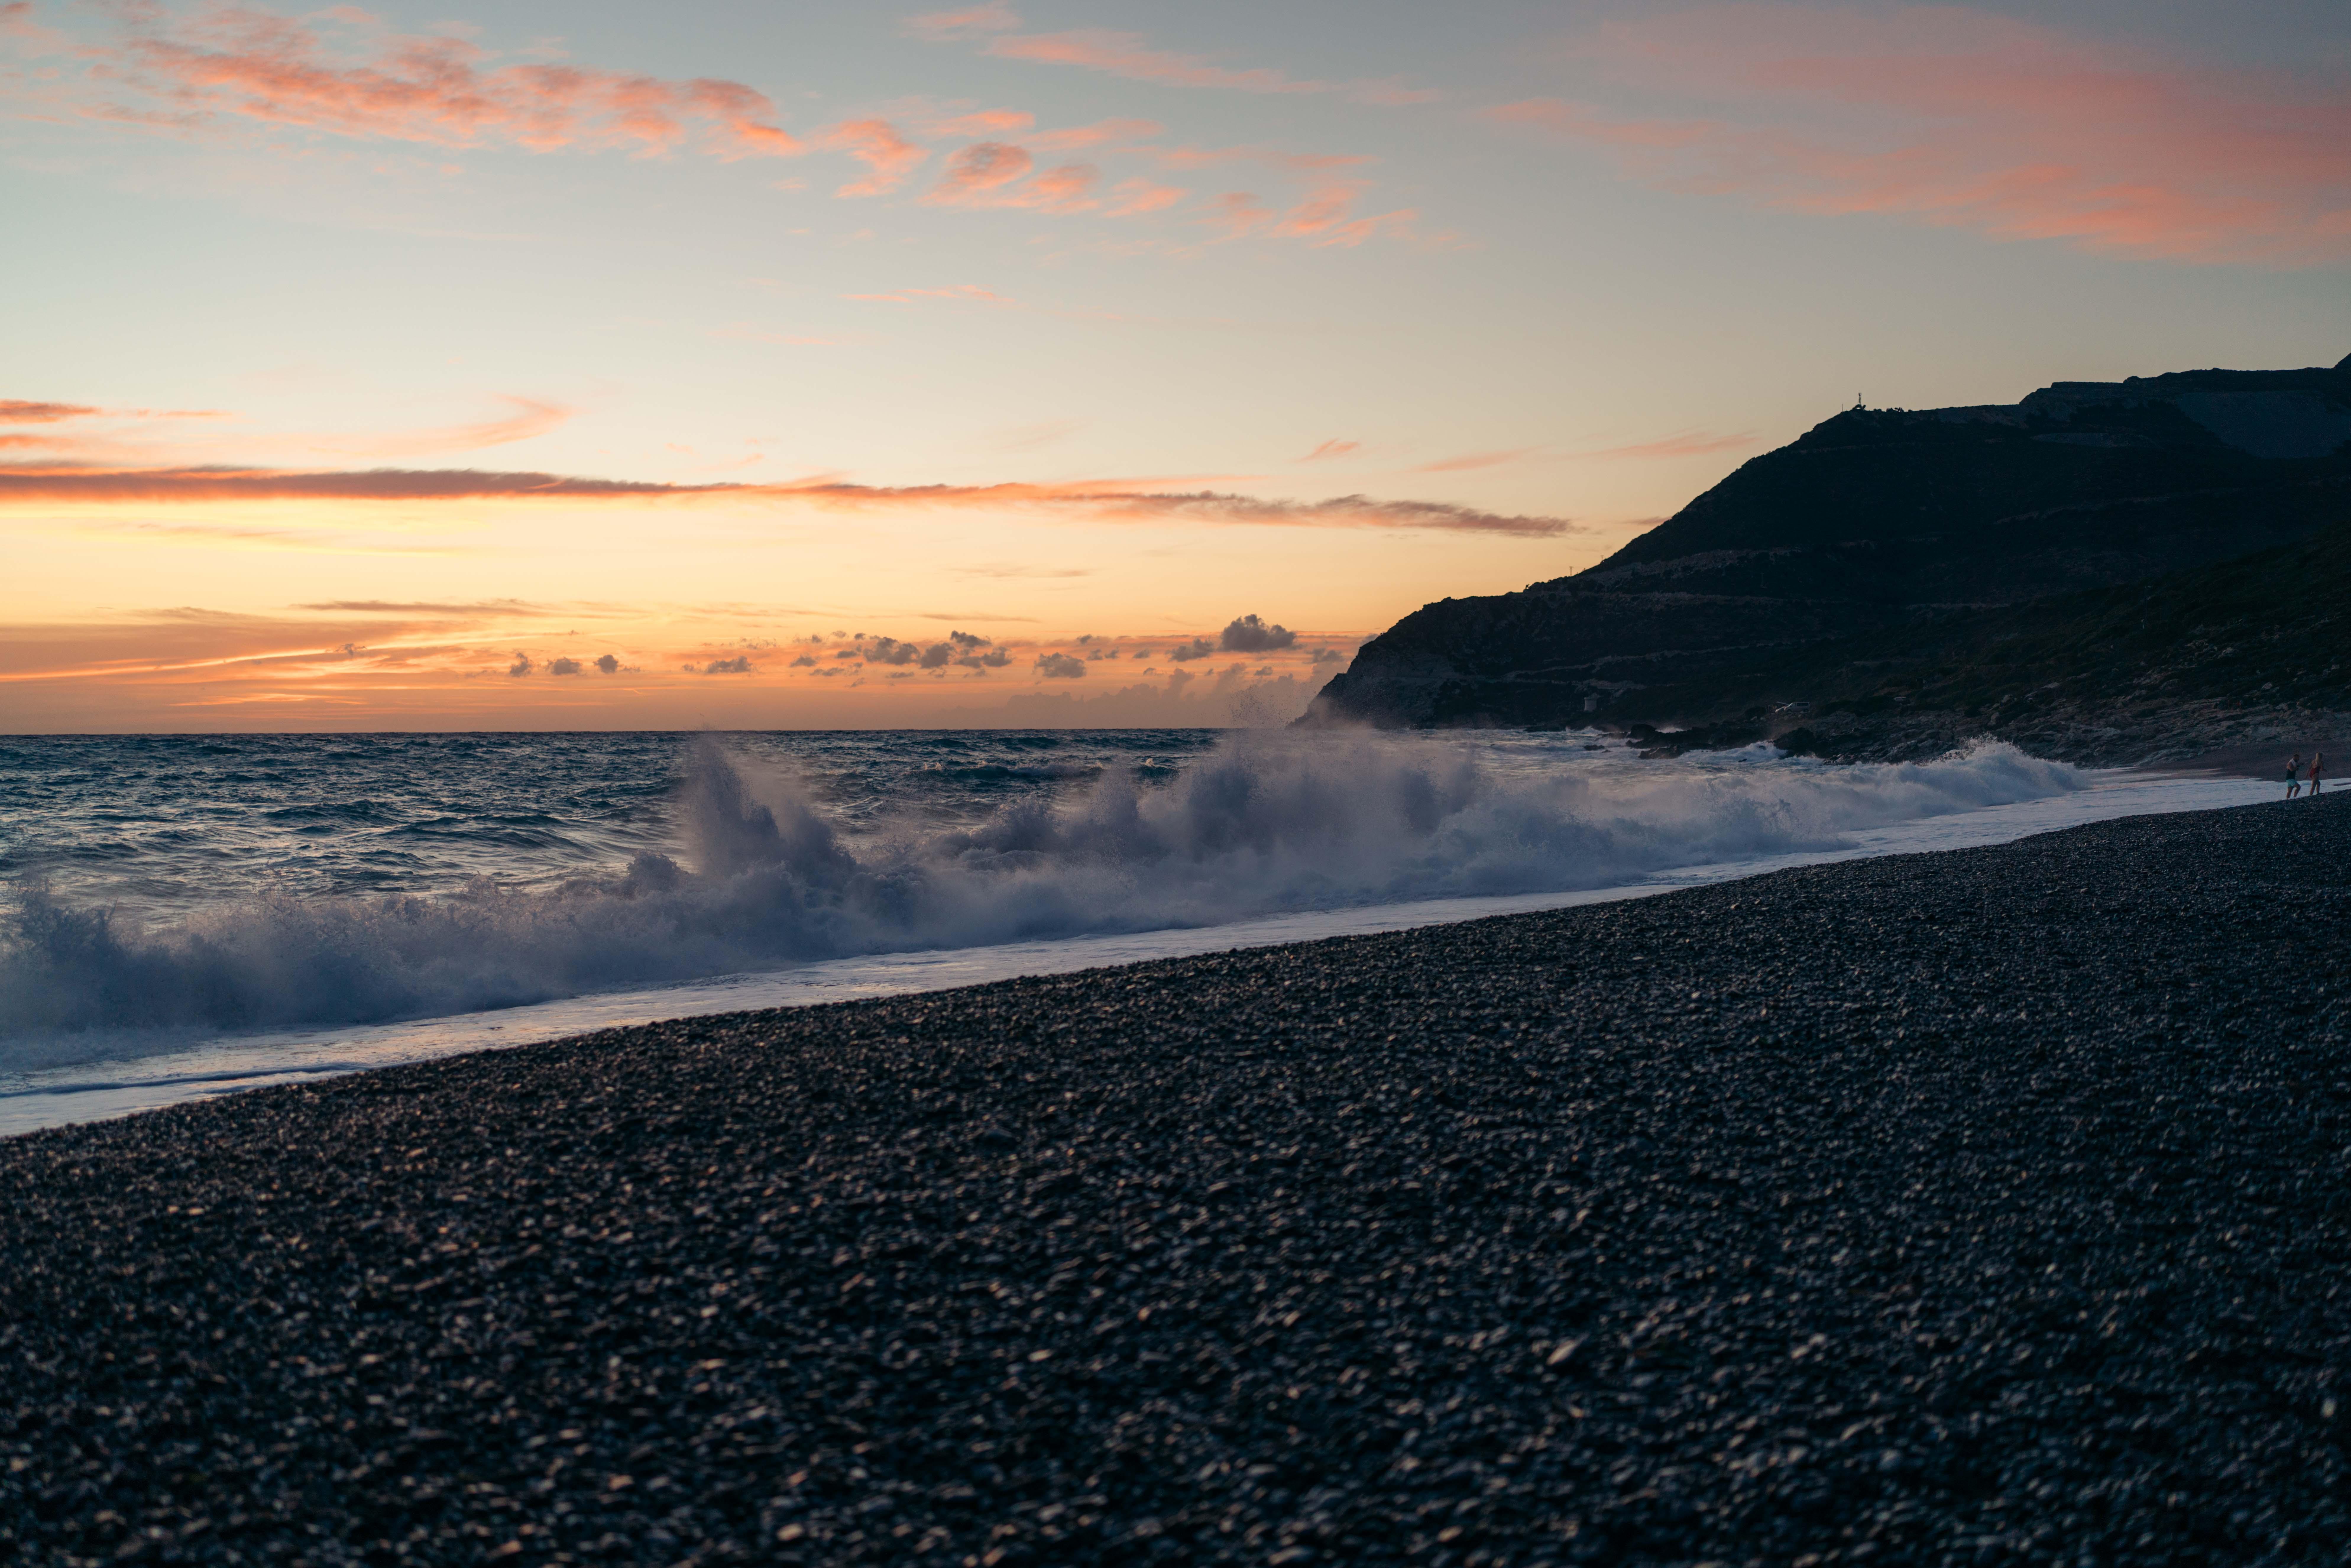 plage de nonza zachód słońca cap corse